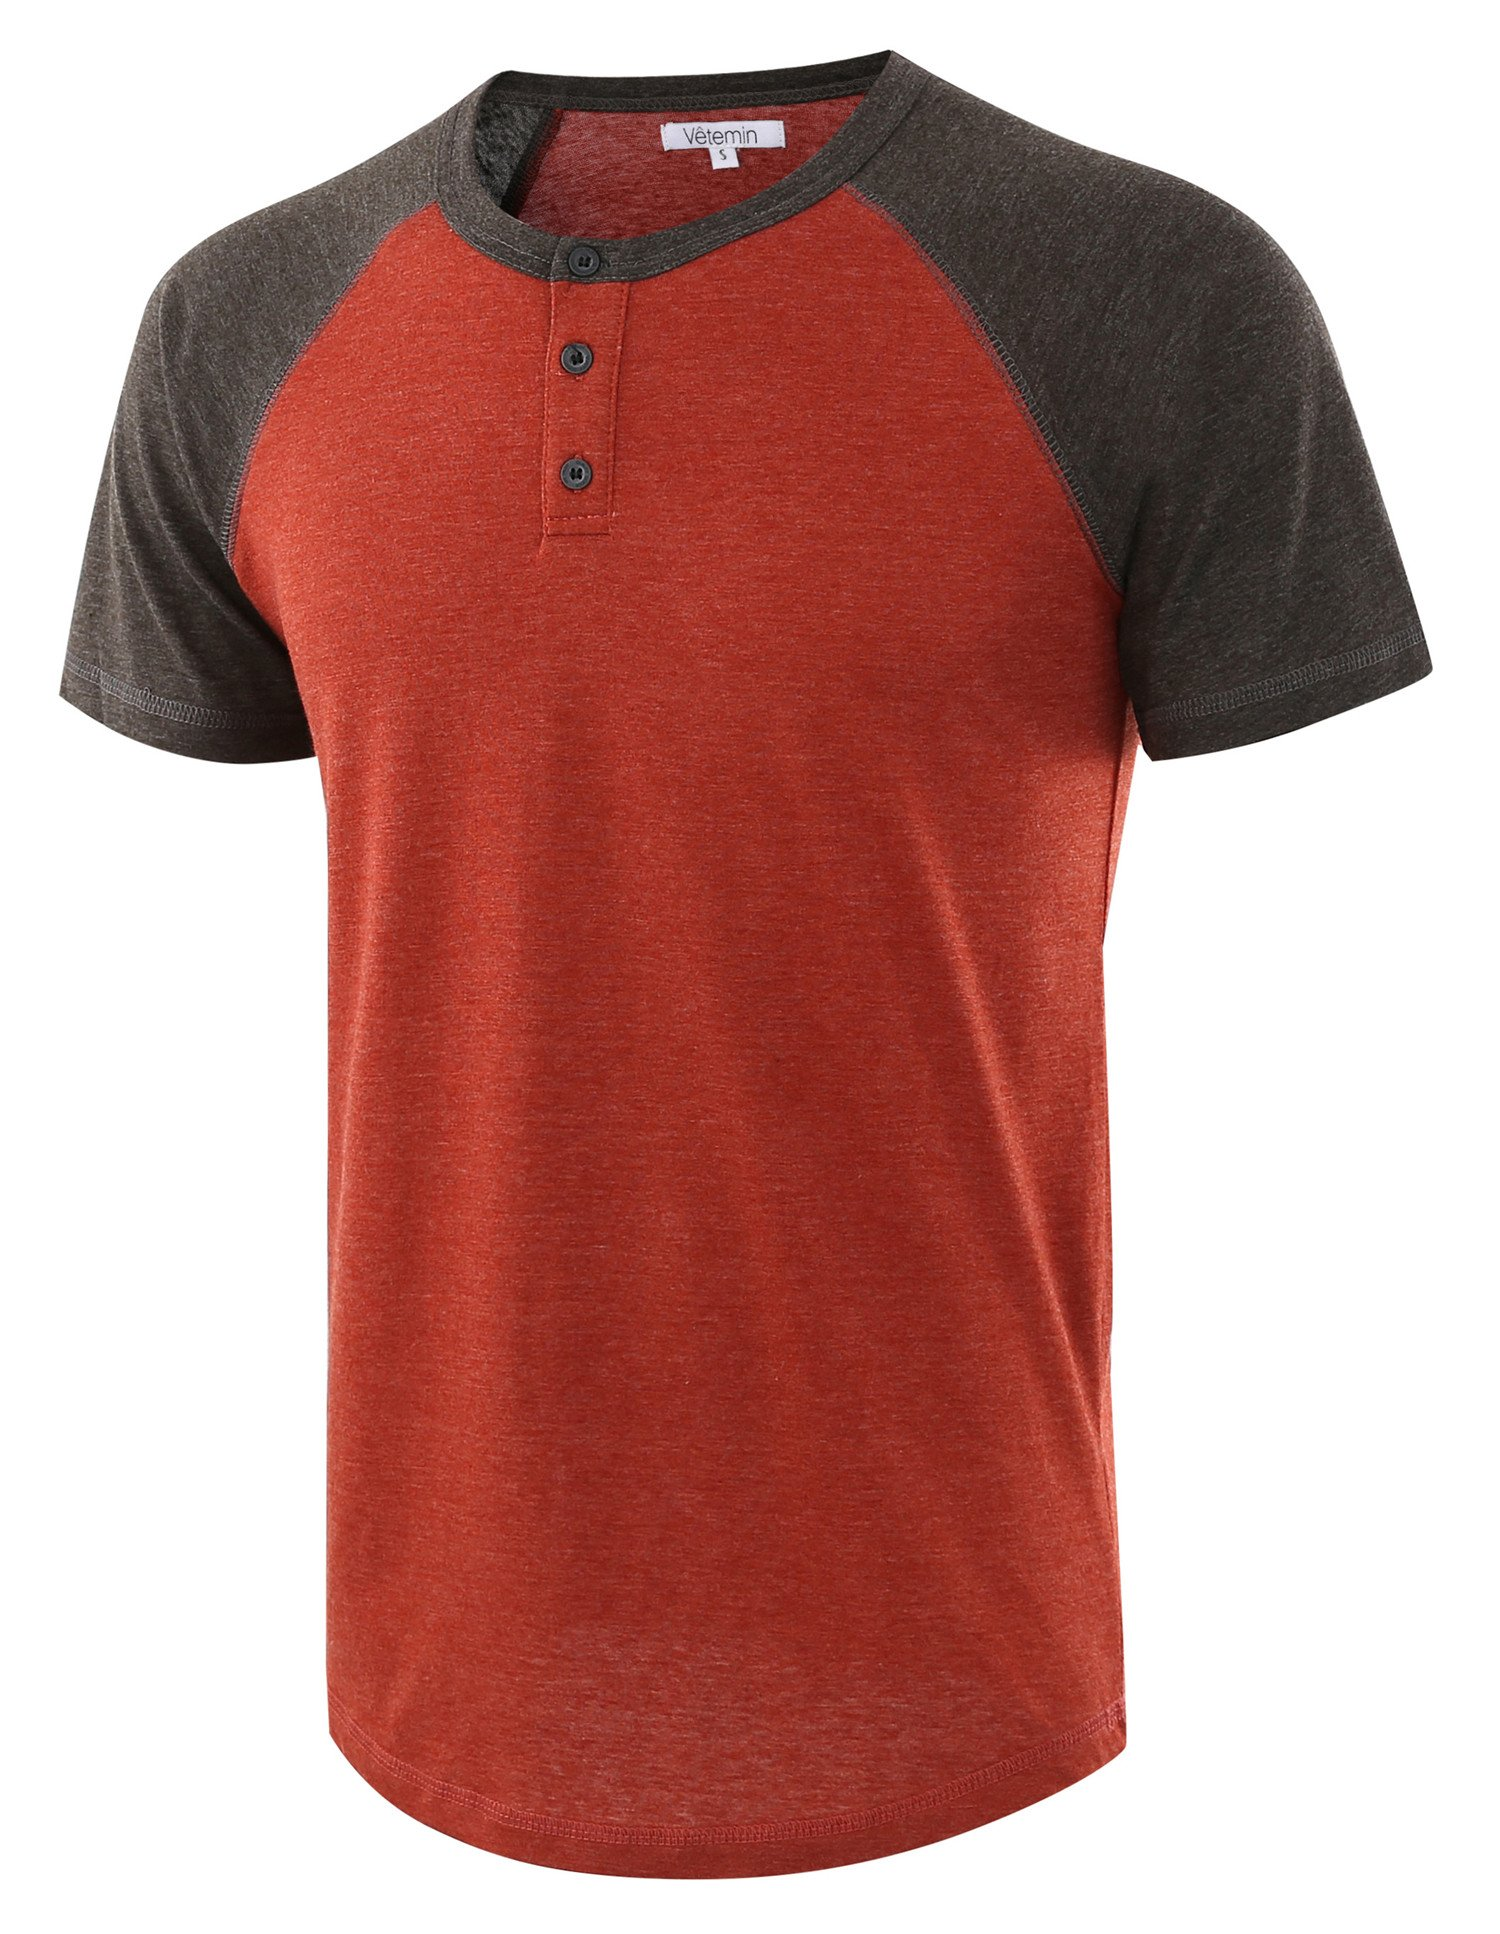 Vetemin Men's Casual Short Sleeve Raglan Henley T-Shirts Baseball Shirts Tee H.Rusty/H.Charcoal L